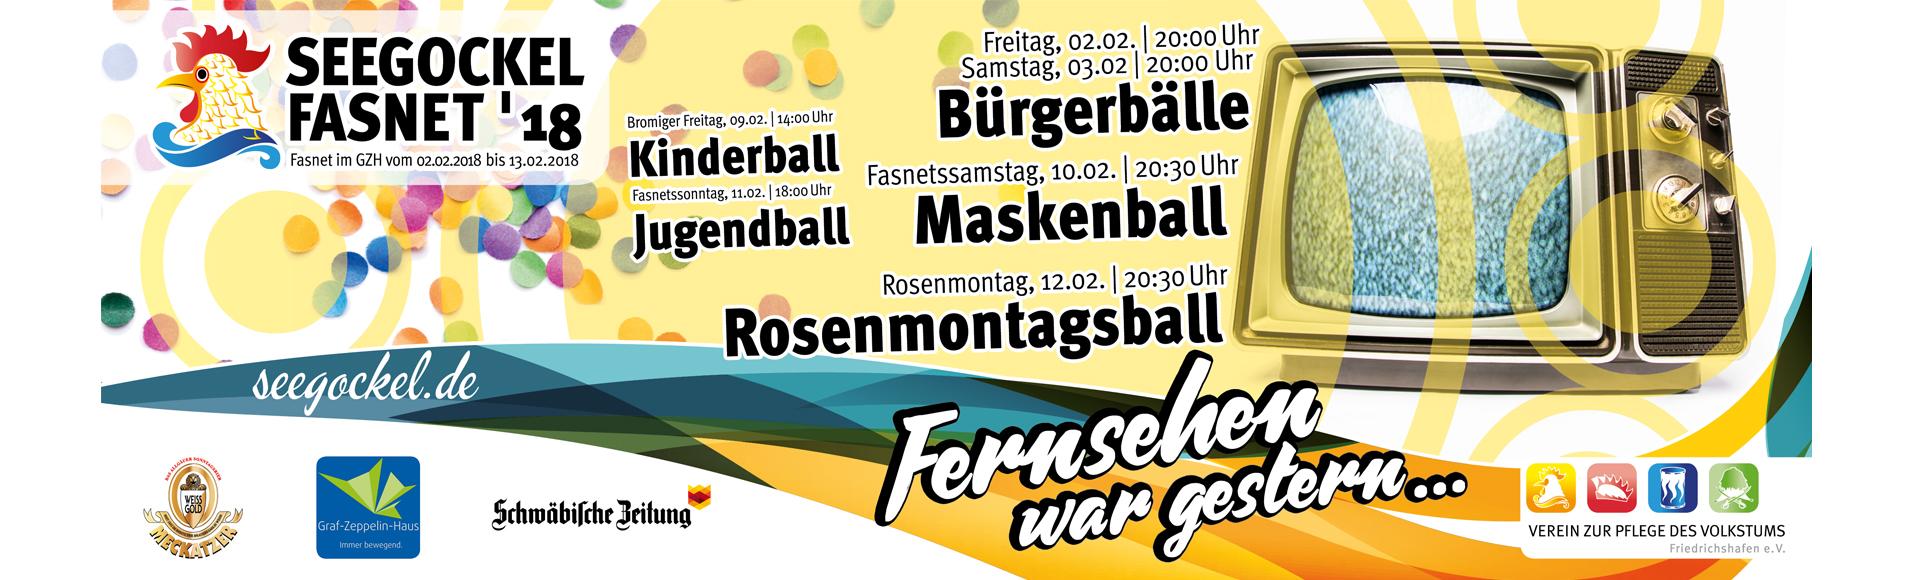 Seegockel Fasnet 2018